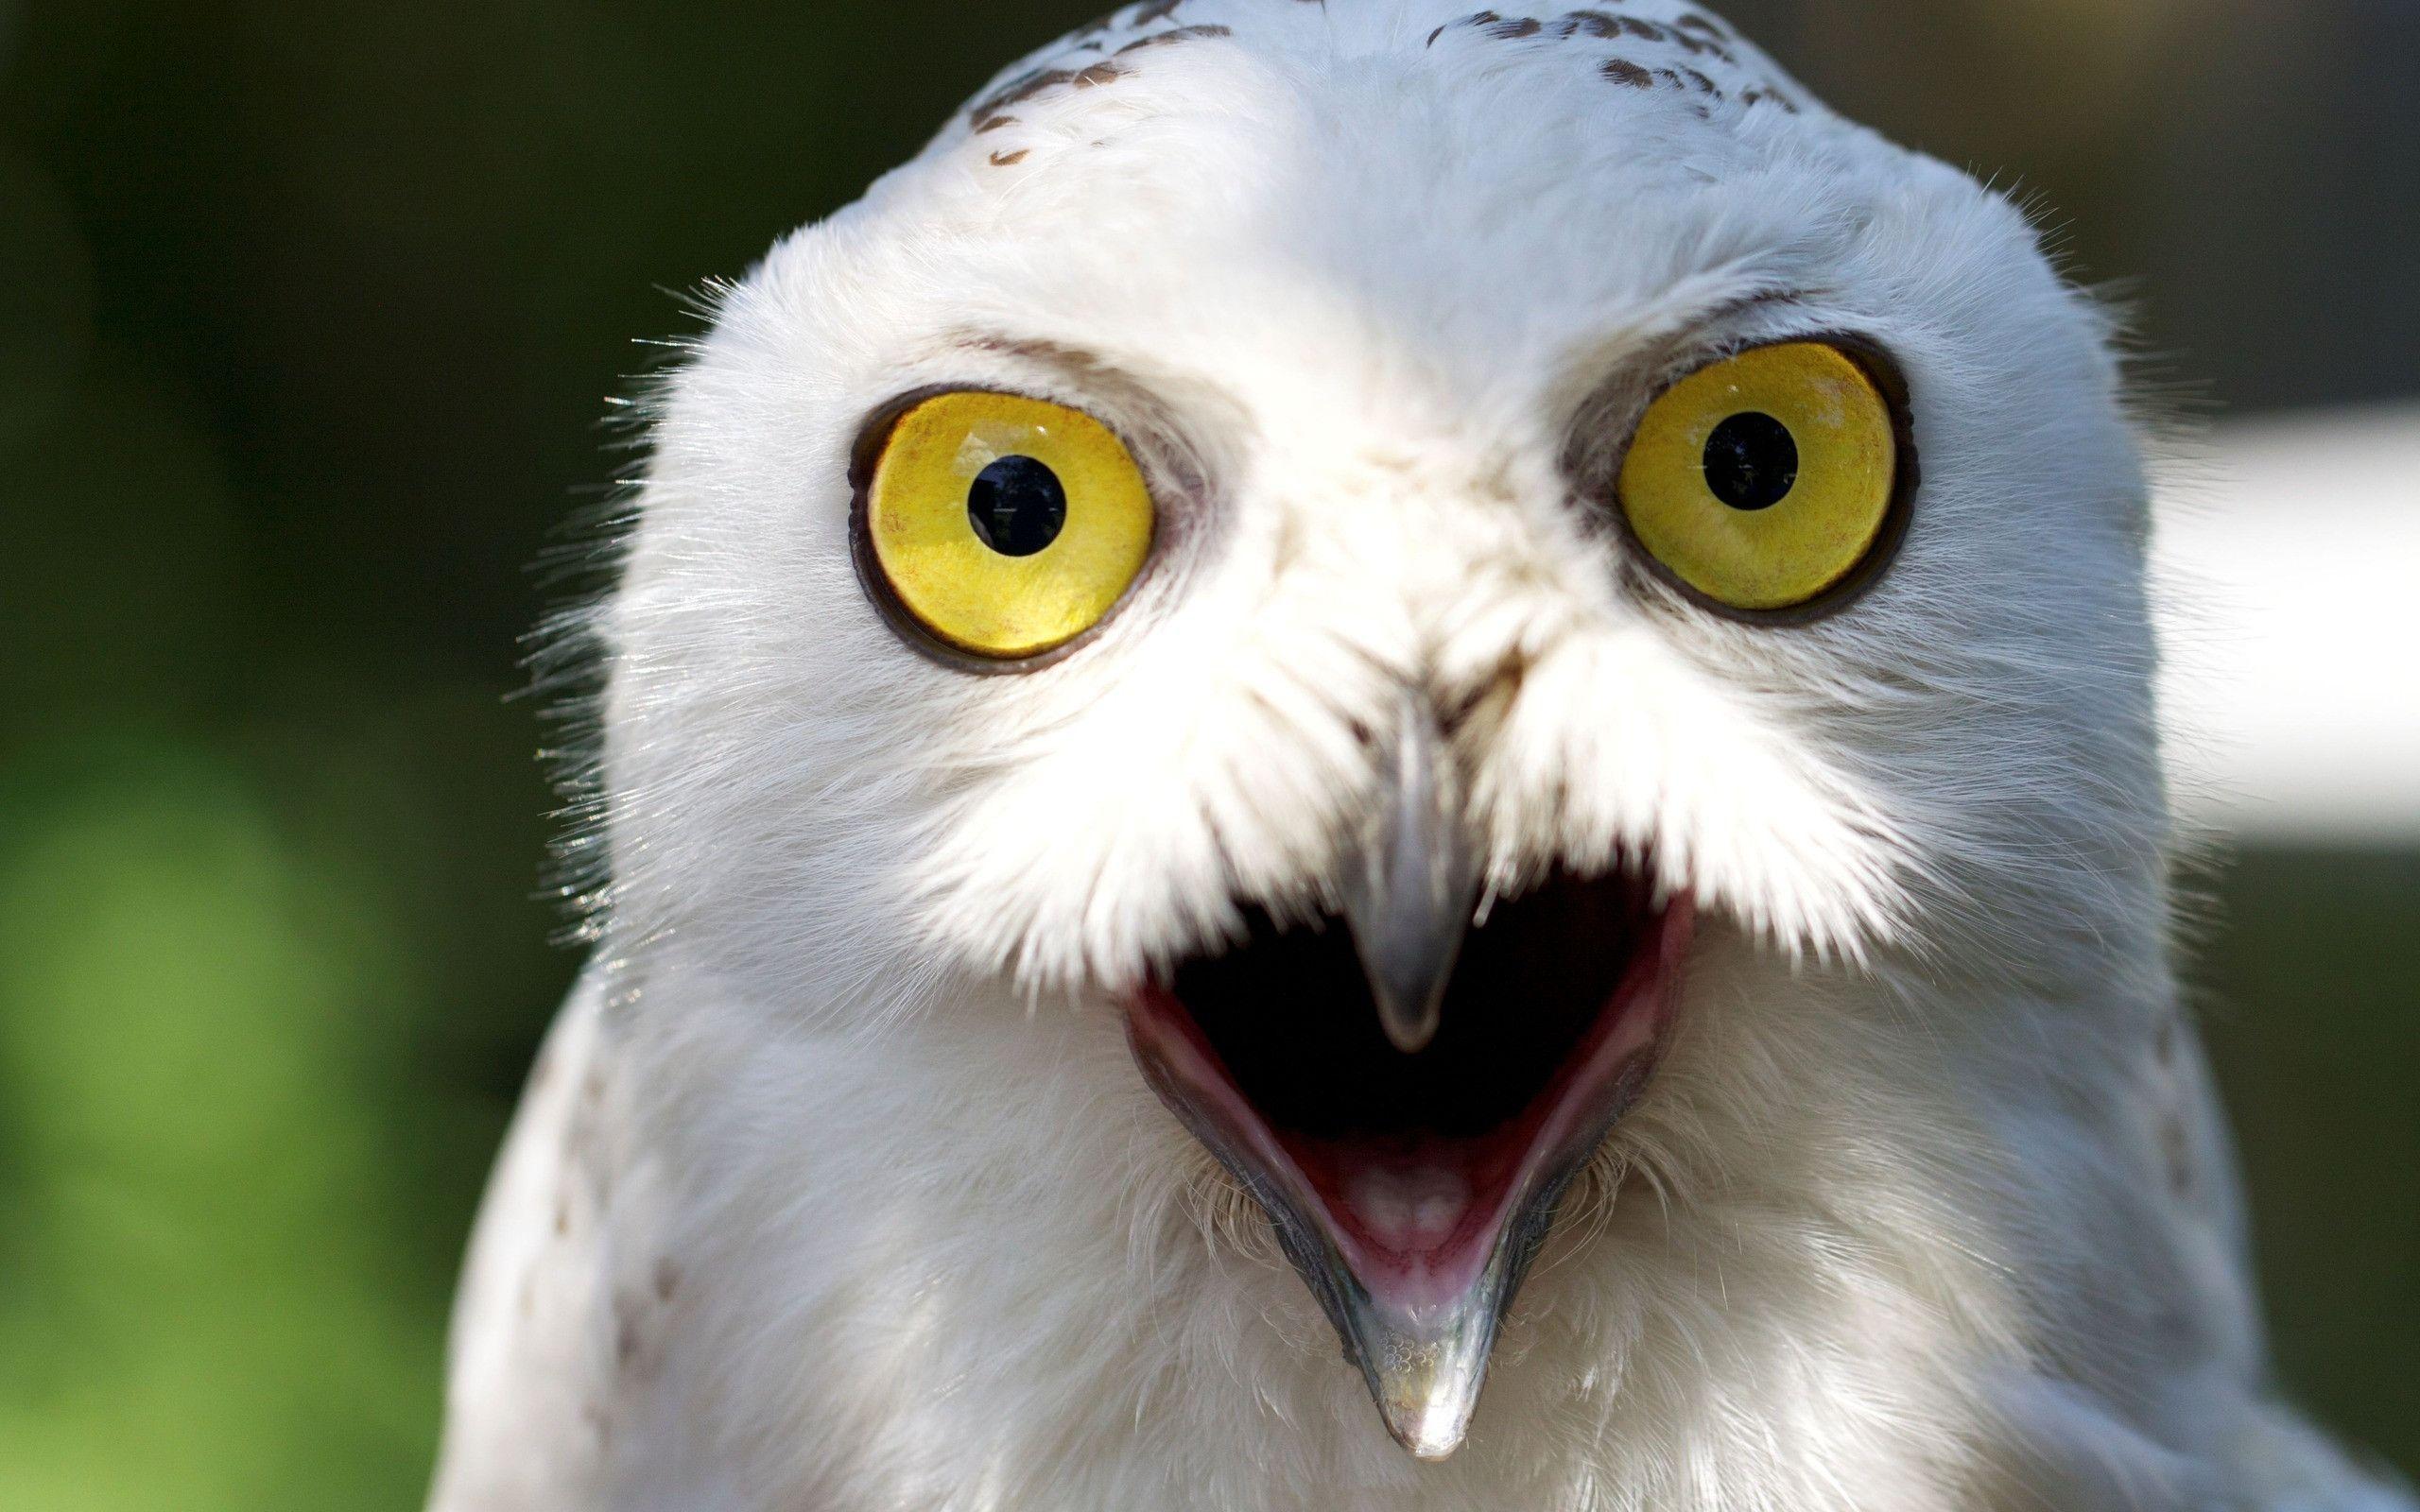 White Owl Images